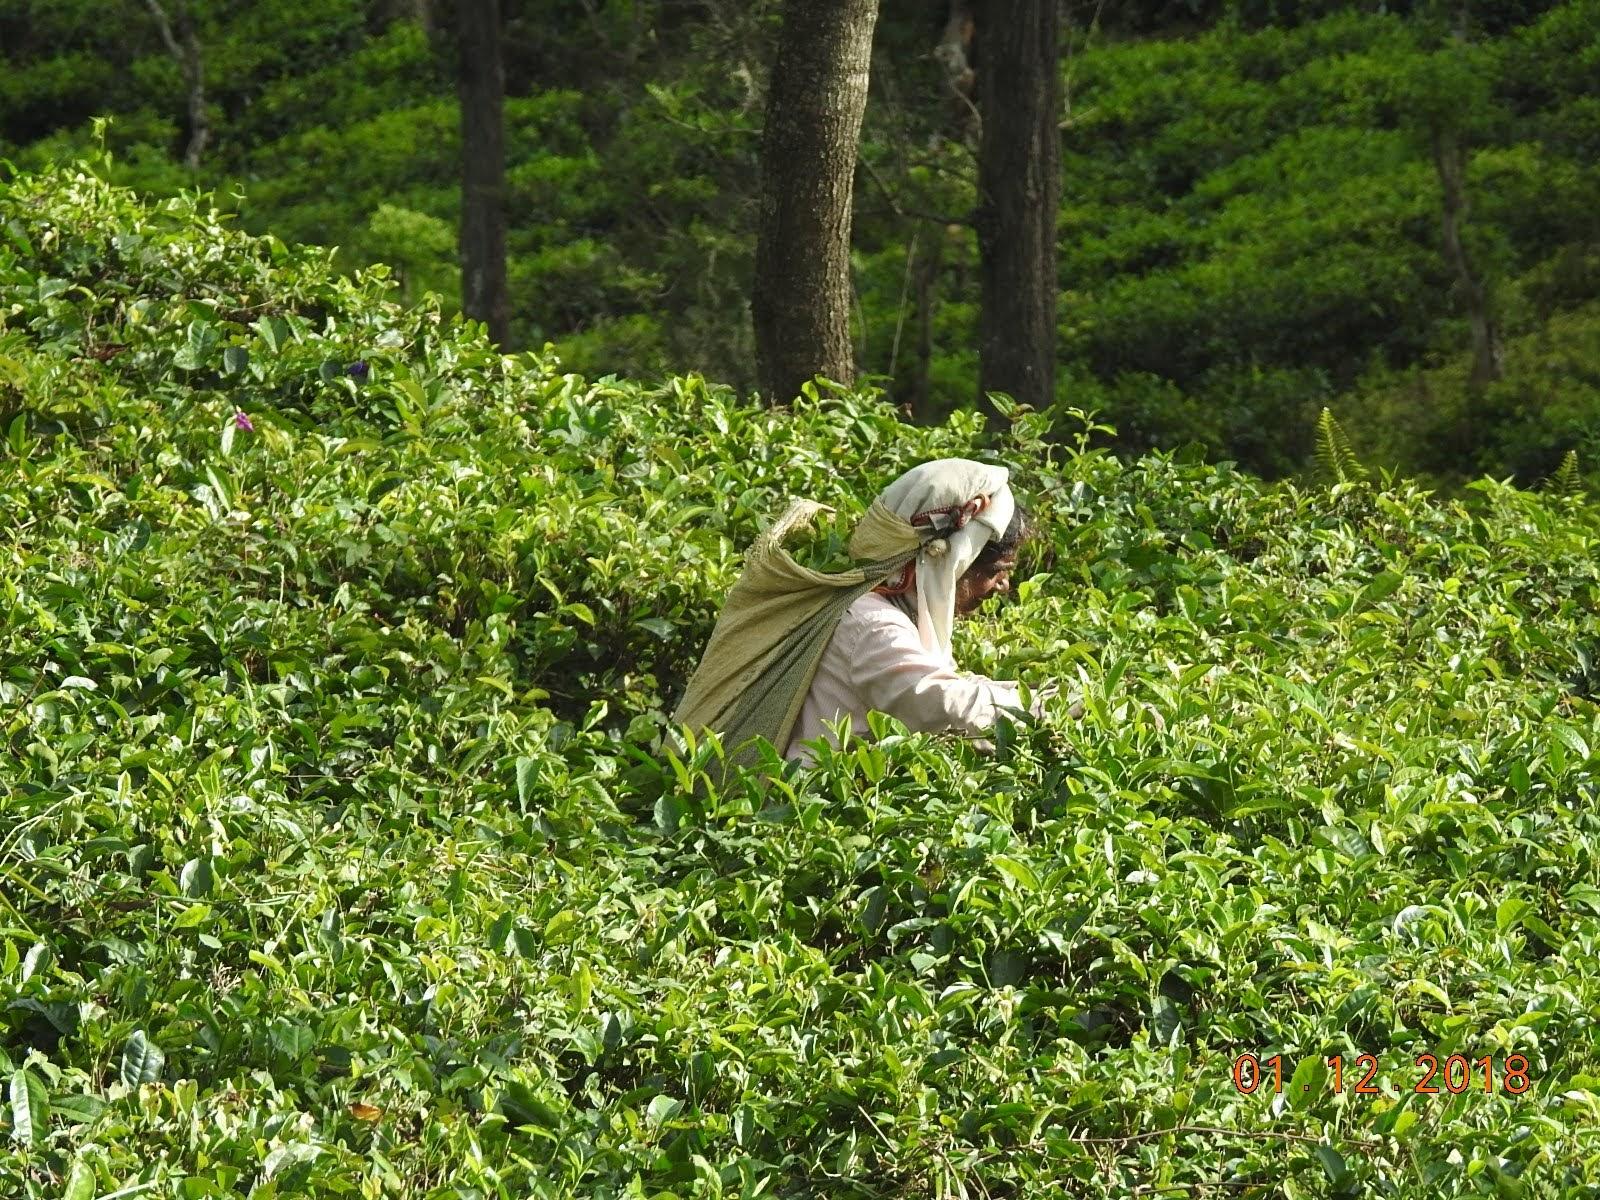 invite-to-paradise-sri-lanka-maldives-holiday-specialists-nutan-vidyut-patel-tea-picker.jpg